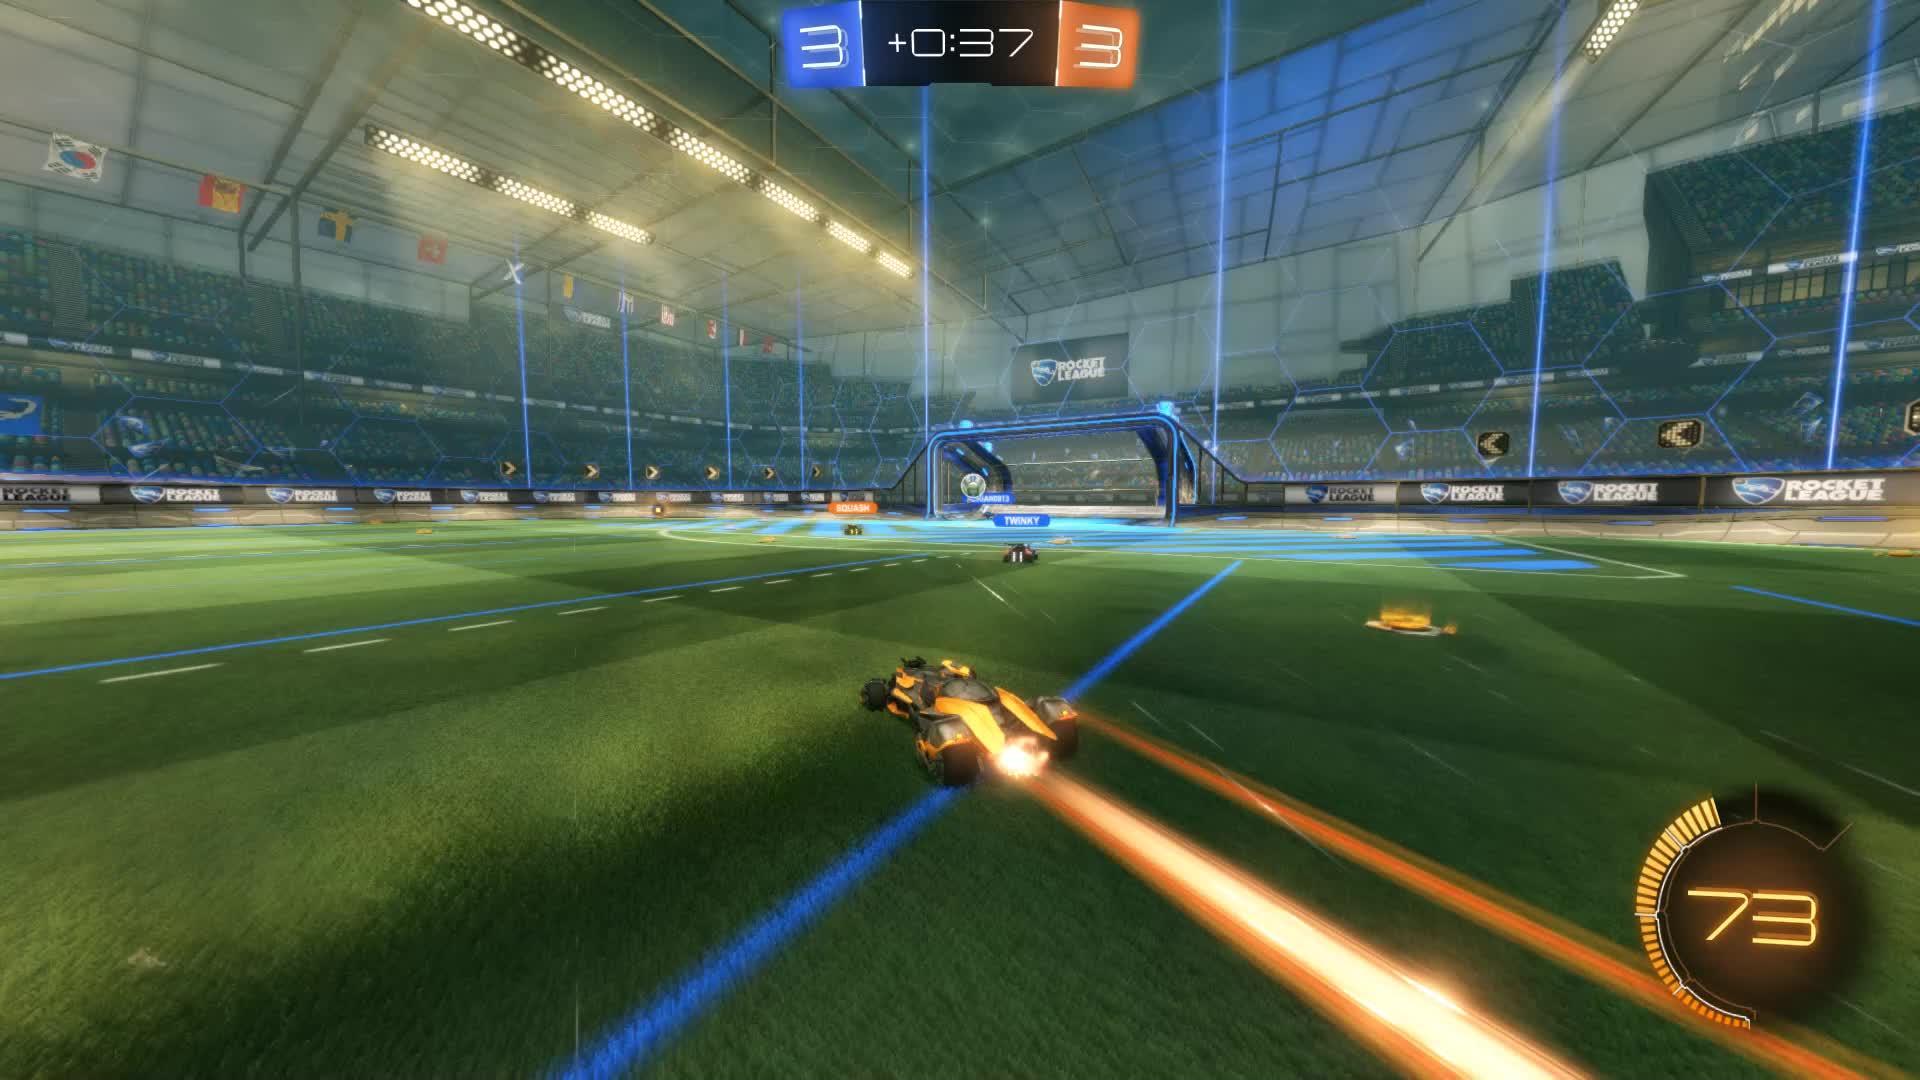 Fab ツ, Gif Your Game, GifYourGame, Goal, Rocket League, RocketLeague, Goal 7: Squash GIFs